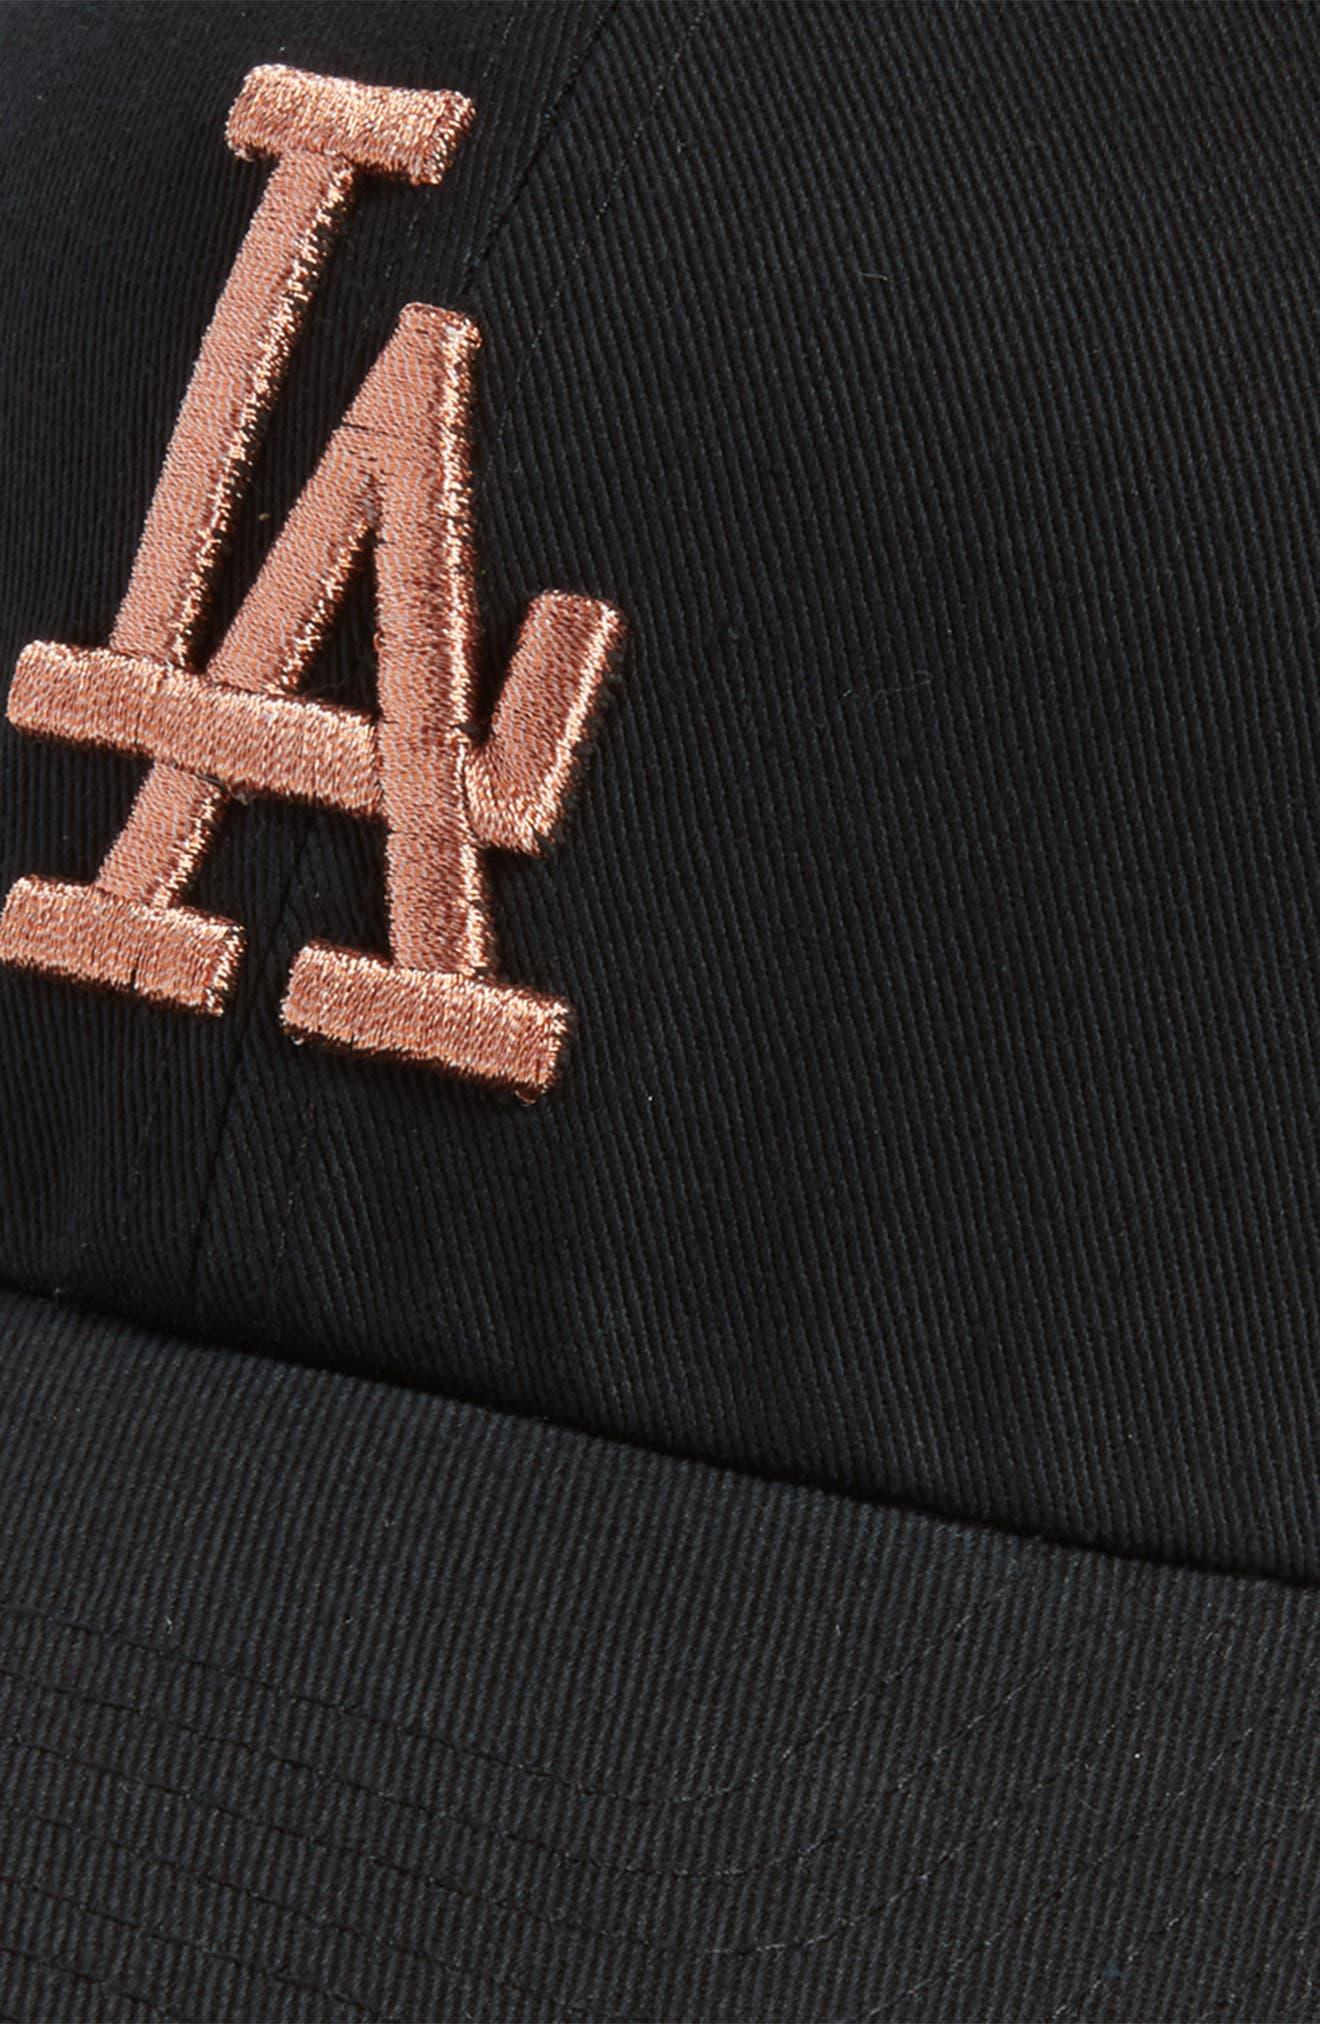 Los Angeles Dodgers Metallic Embroidery Cap,                             Alternate thumbnail 3, color,                             Black